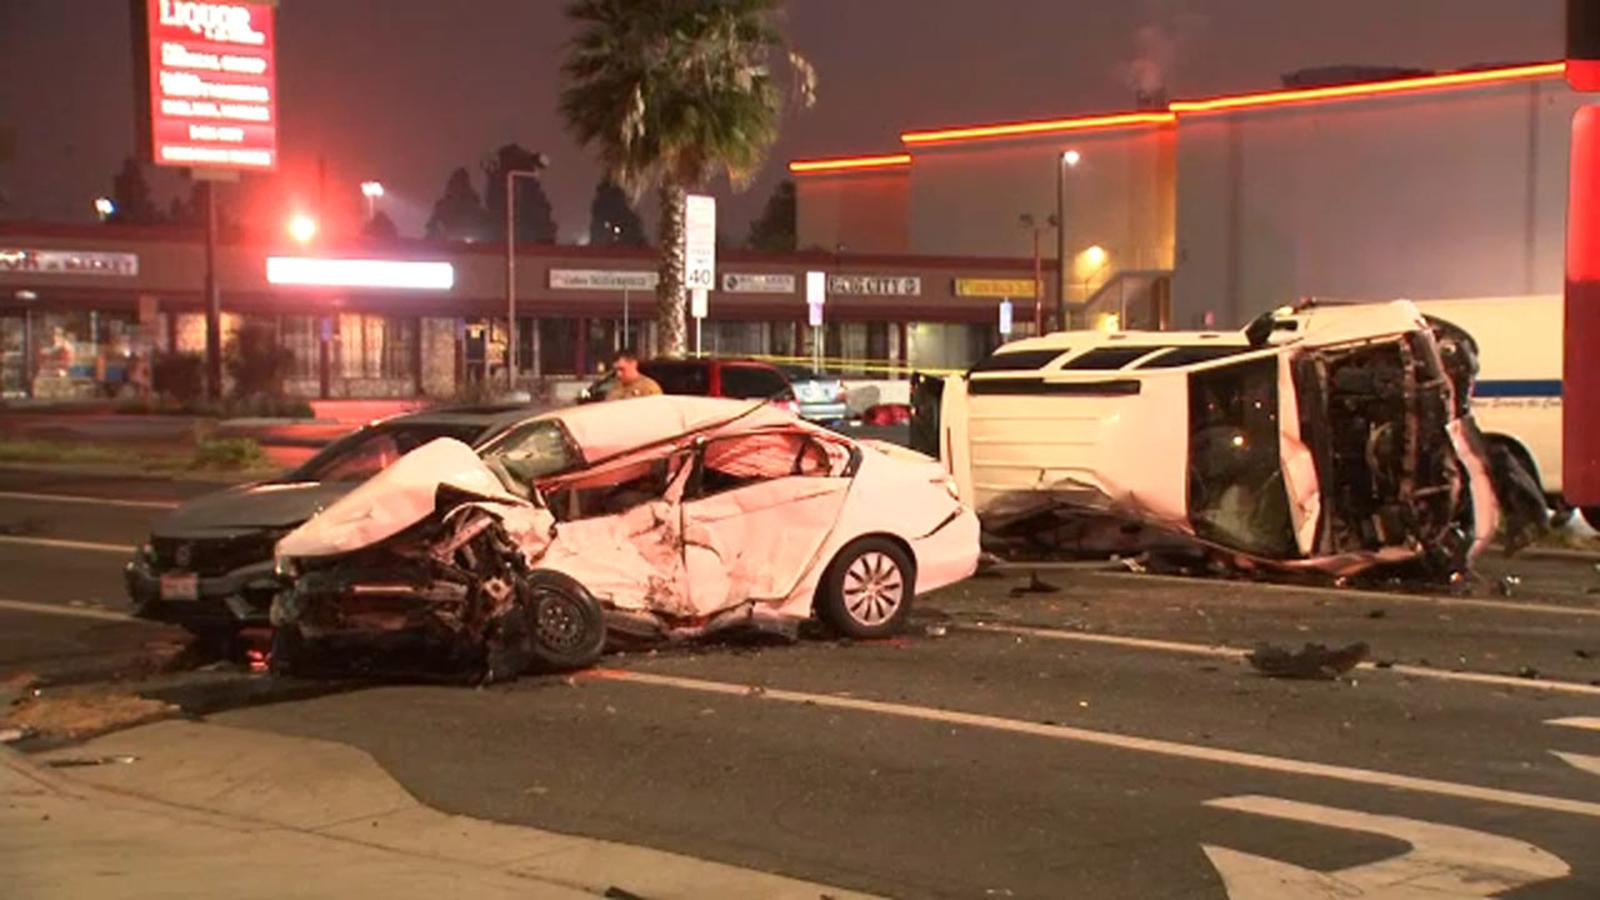 2 dead, 1 injured after crash involving several vehicles in Hawaiian Gardens